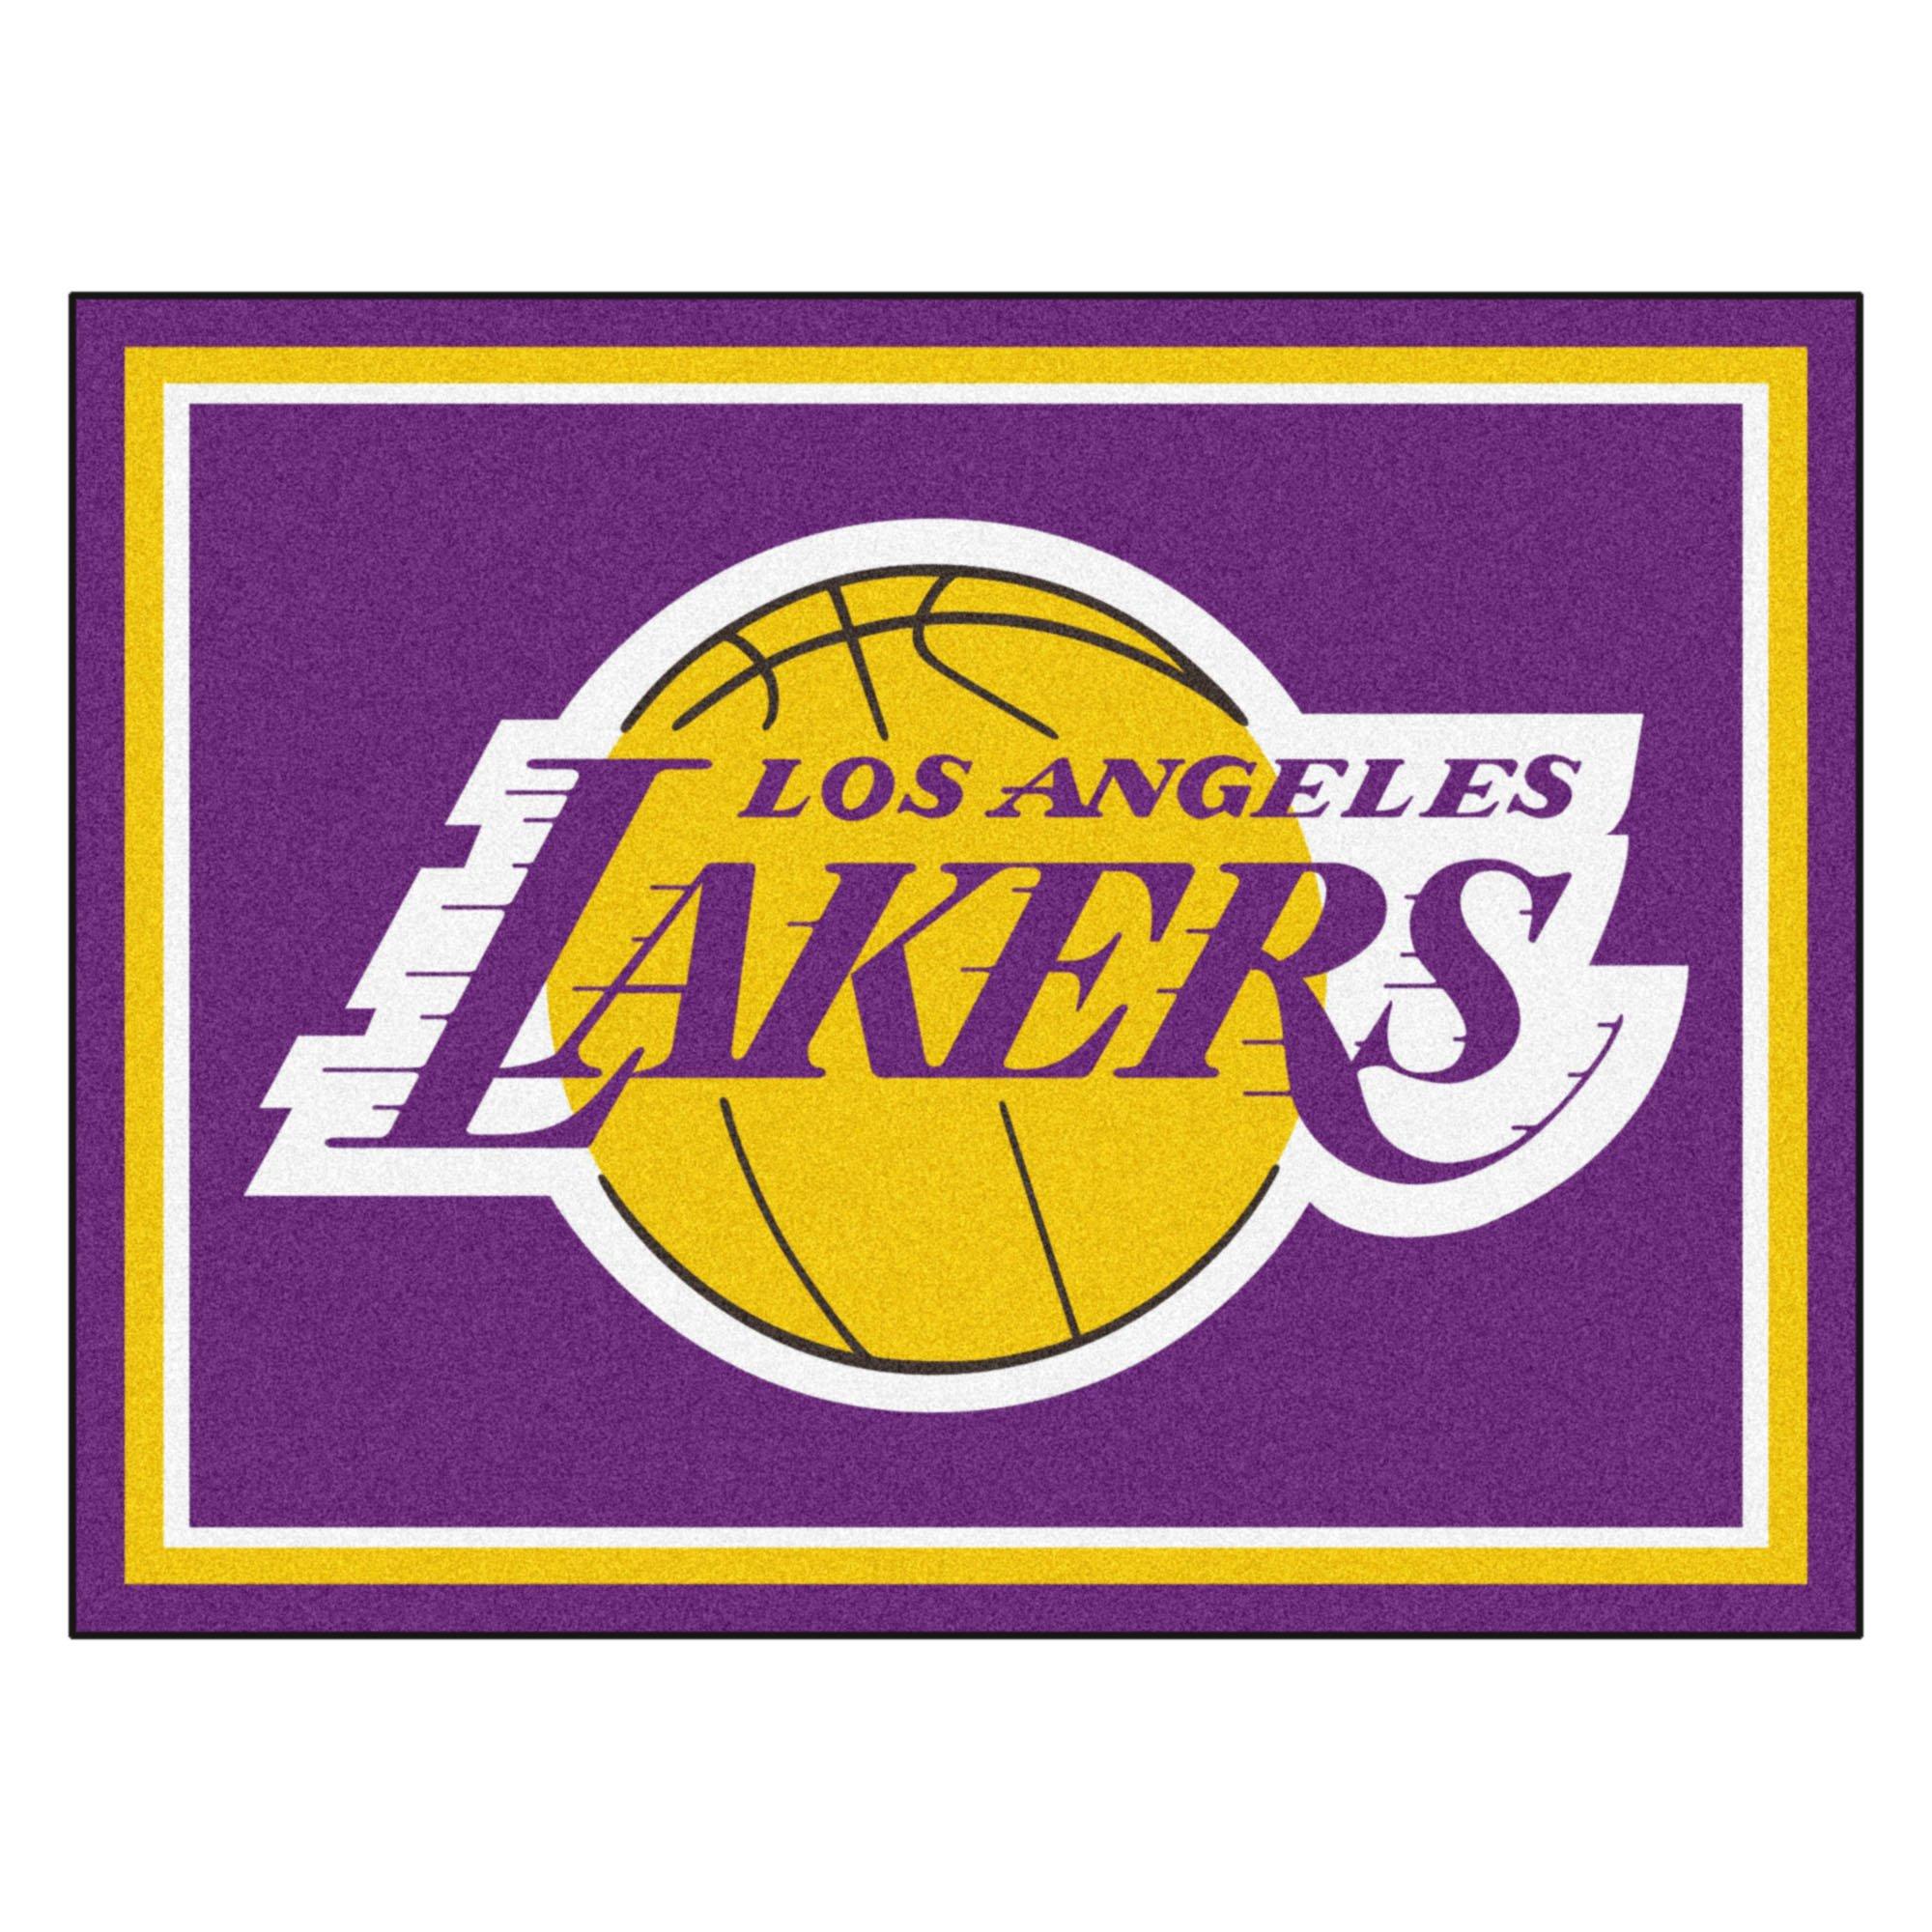 FANMATS 17455 NBA Los Angeles Lakers Rug